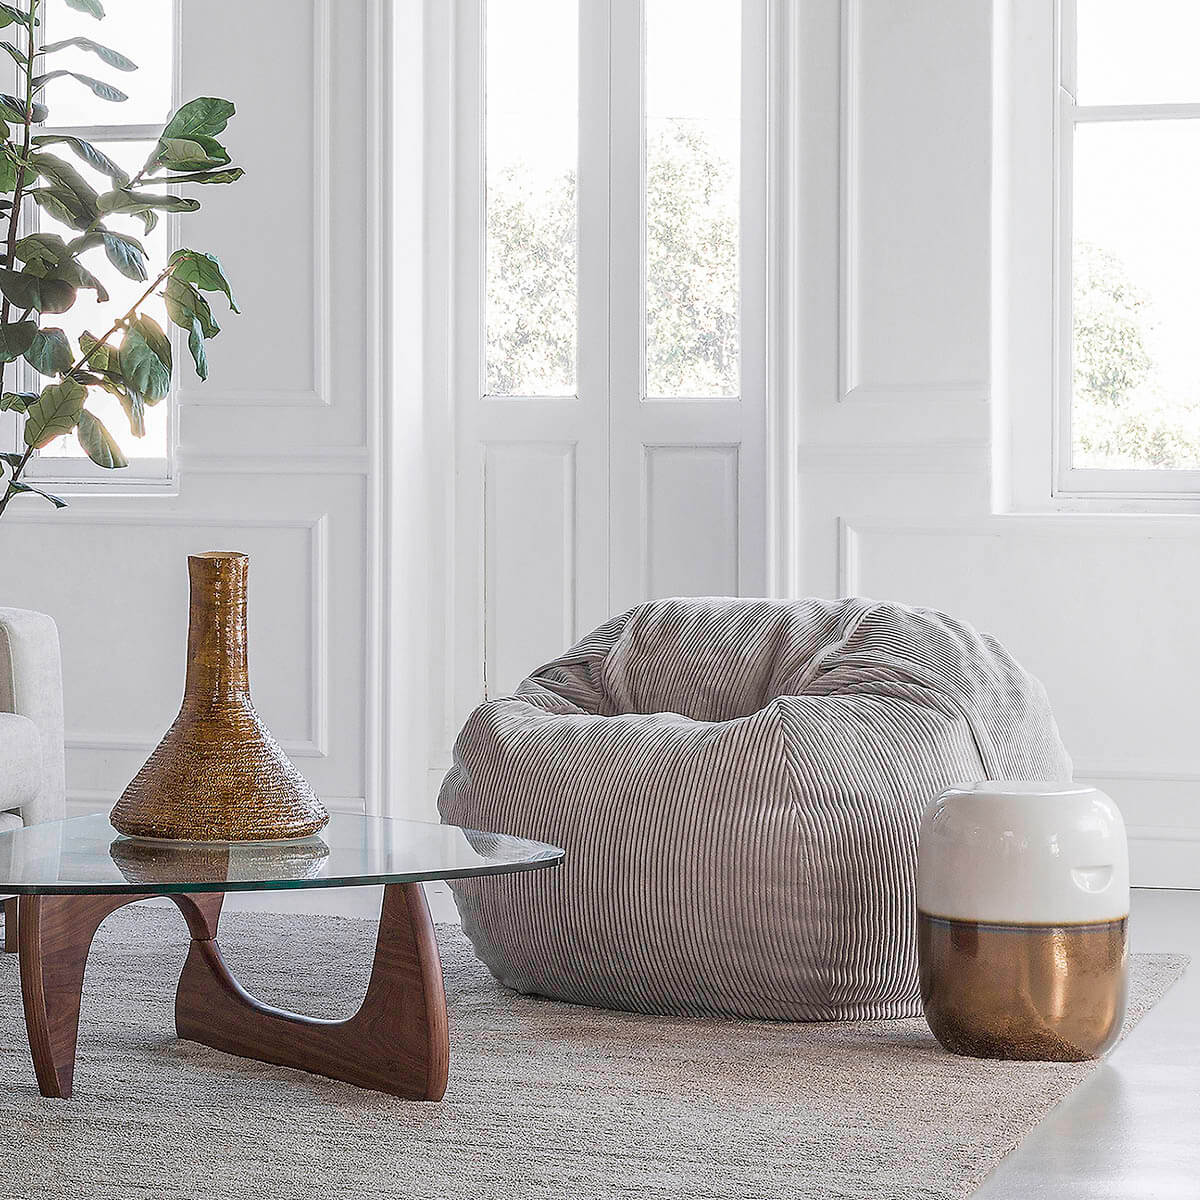 sitzsack cord online kaufen einzigartigen komfort erleben satamo. Black Bedroom Furniture Sets. Home Design Ideas